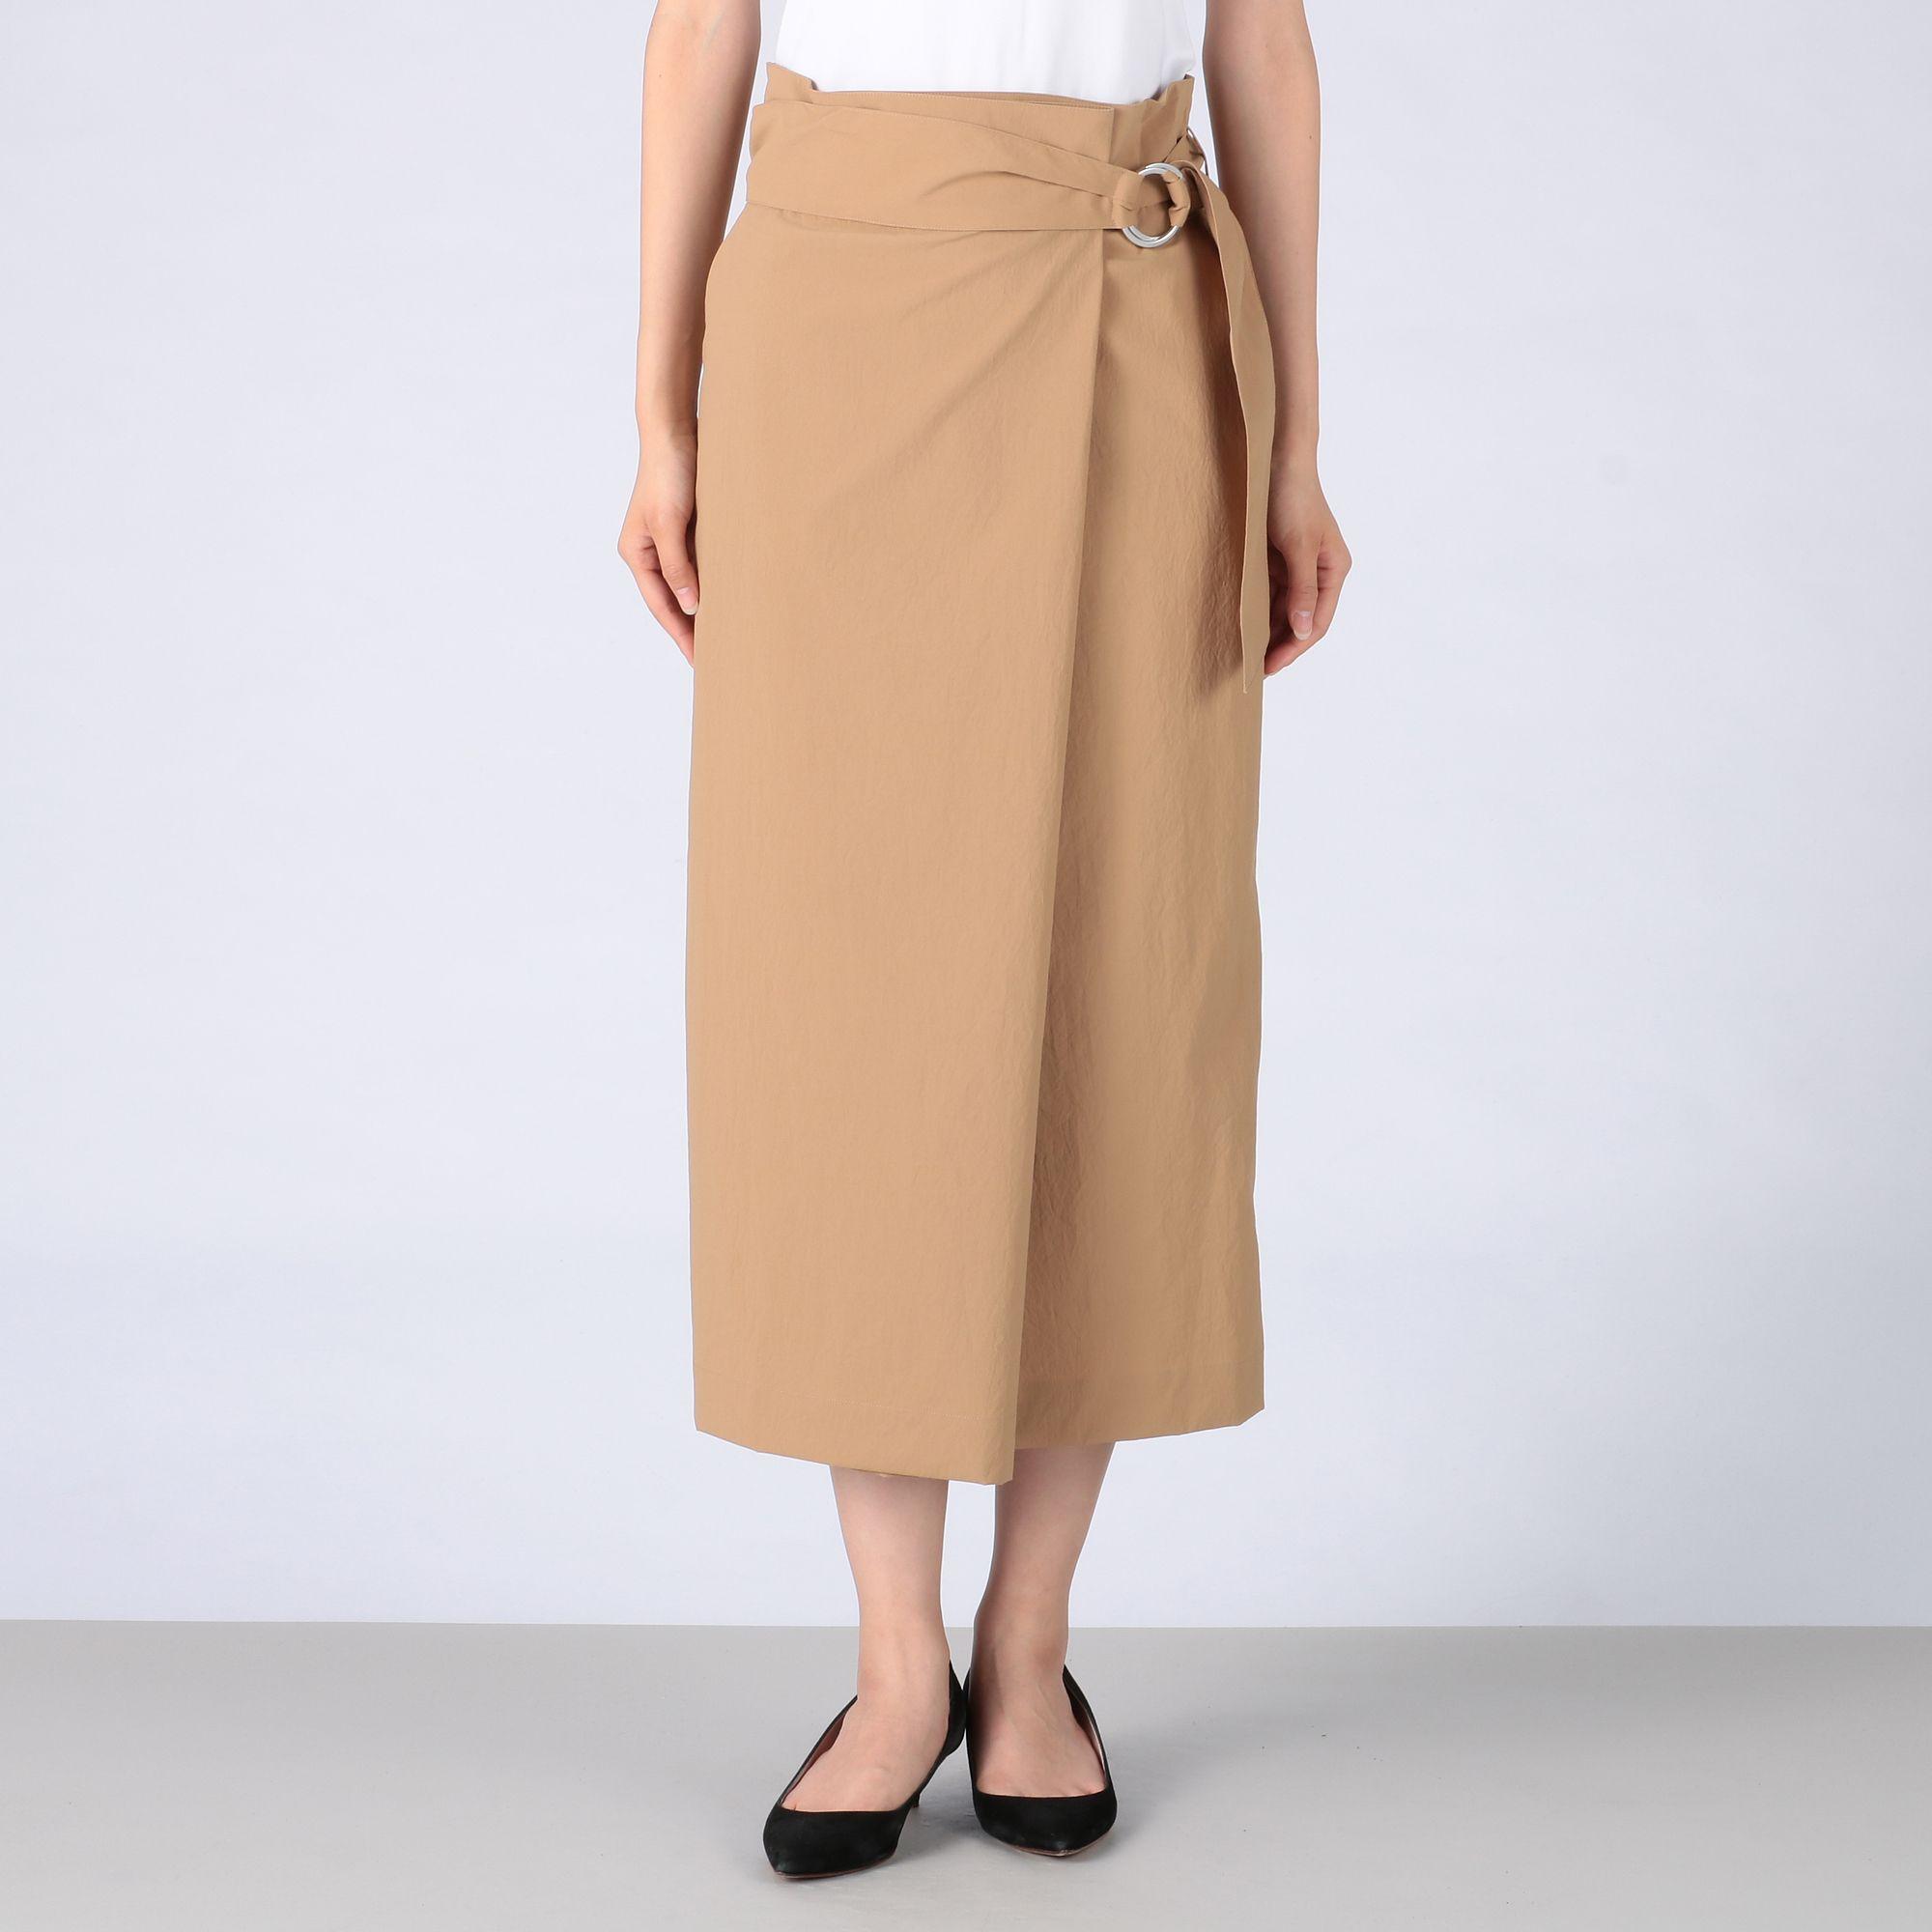 Tiaraティアラ/タスラン巻き風サッシュベルト付タイトスカート